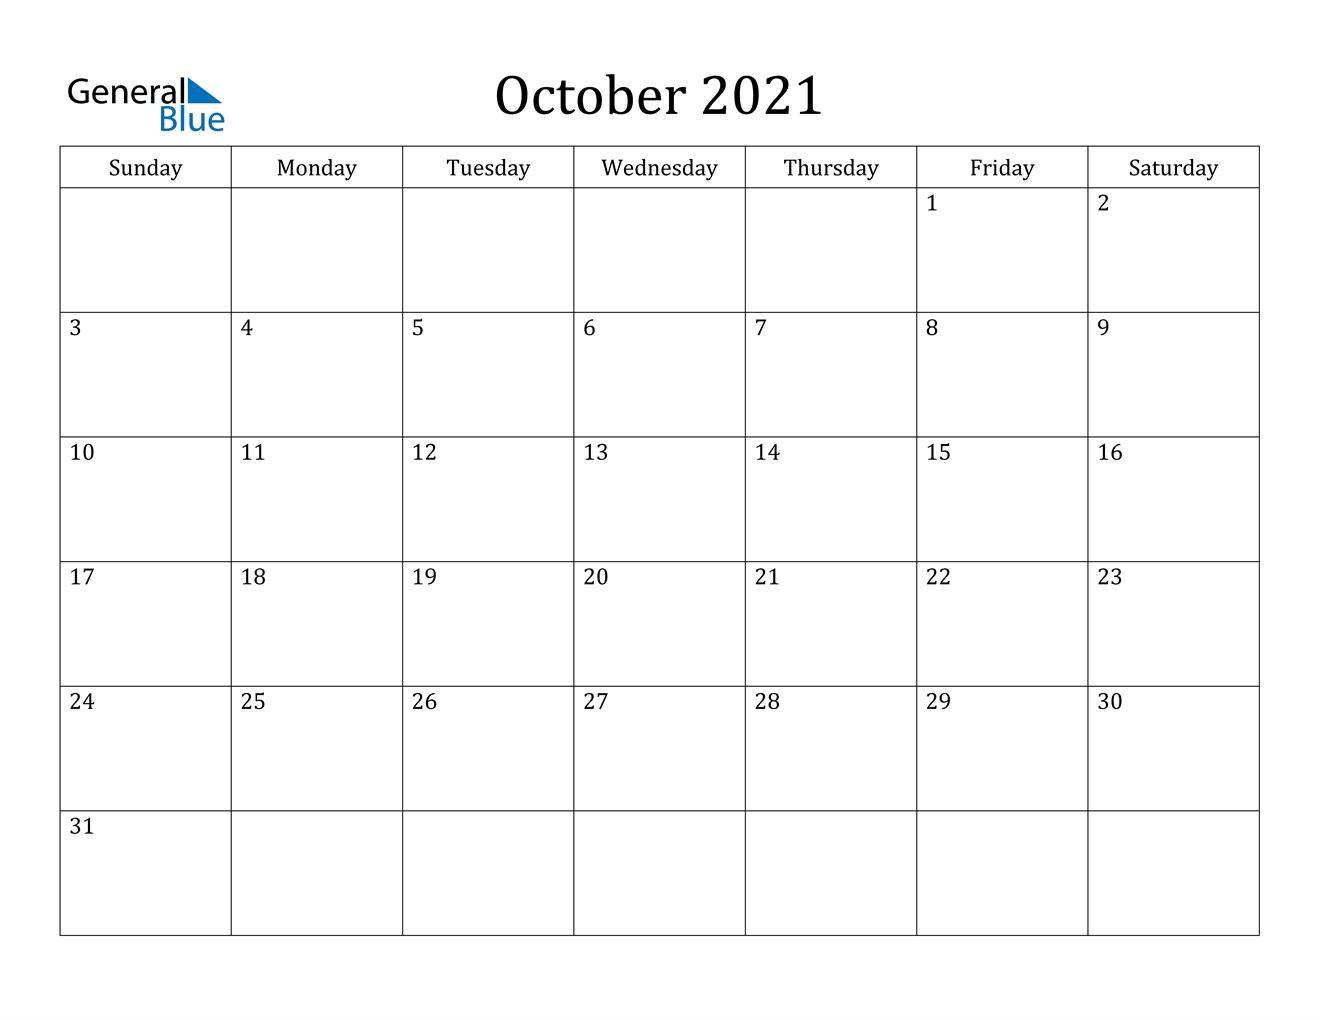 Get August Through To October 2021 Editable Calendar